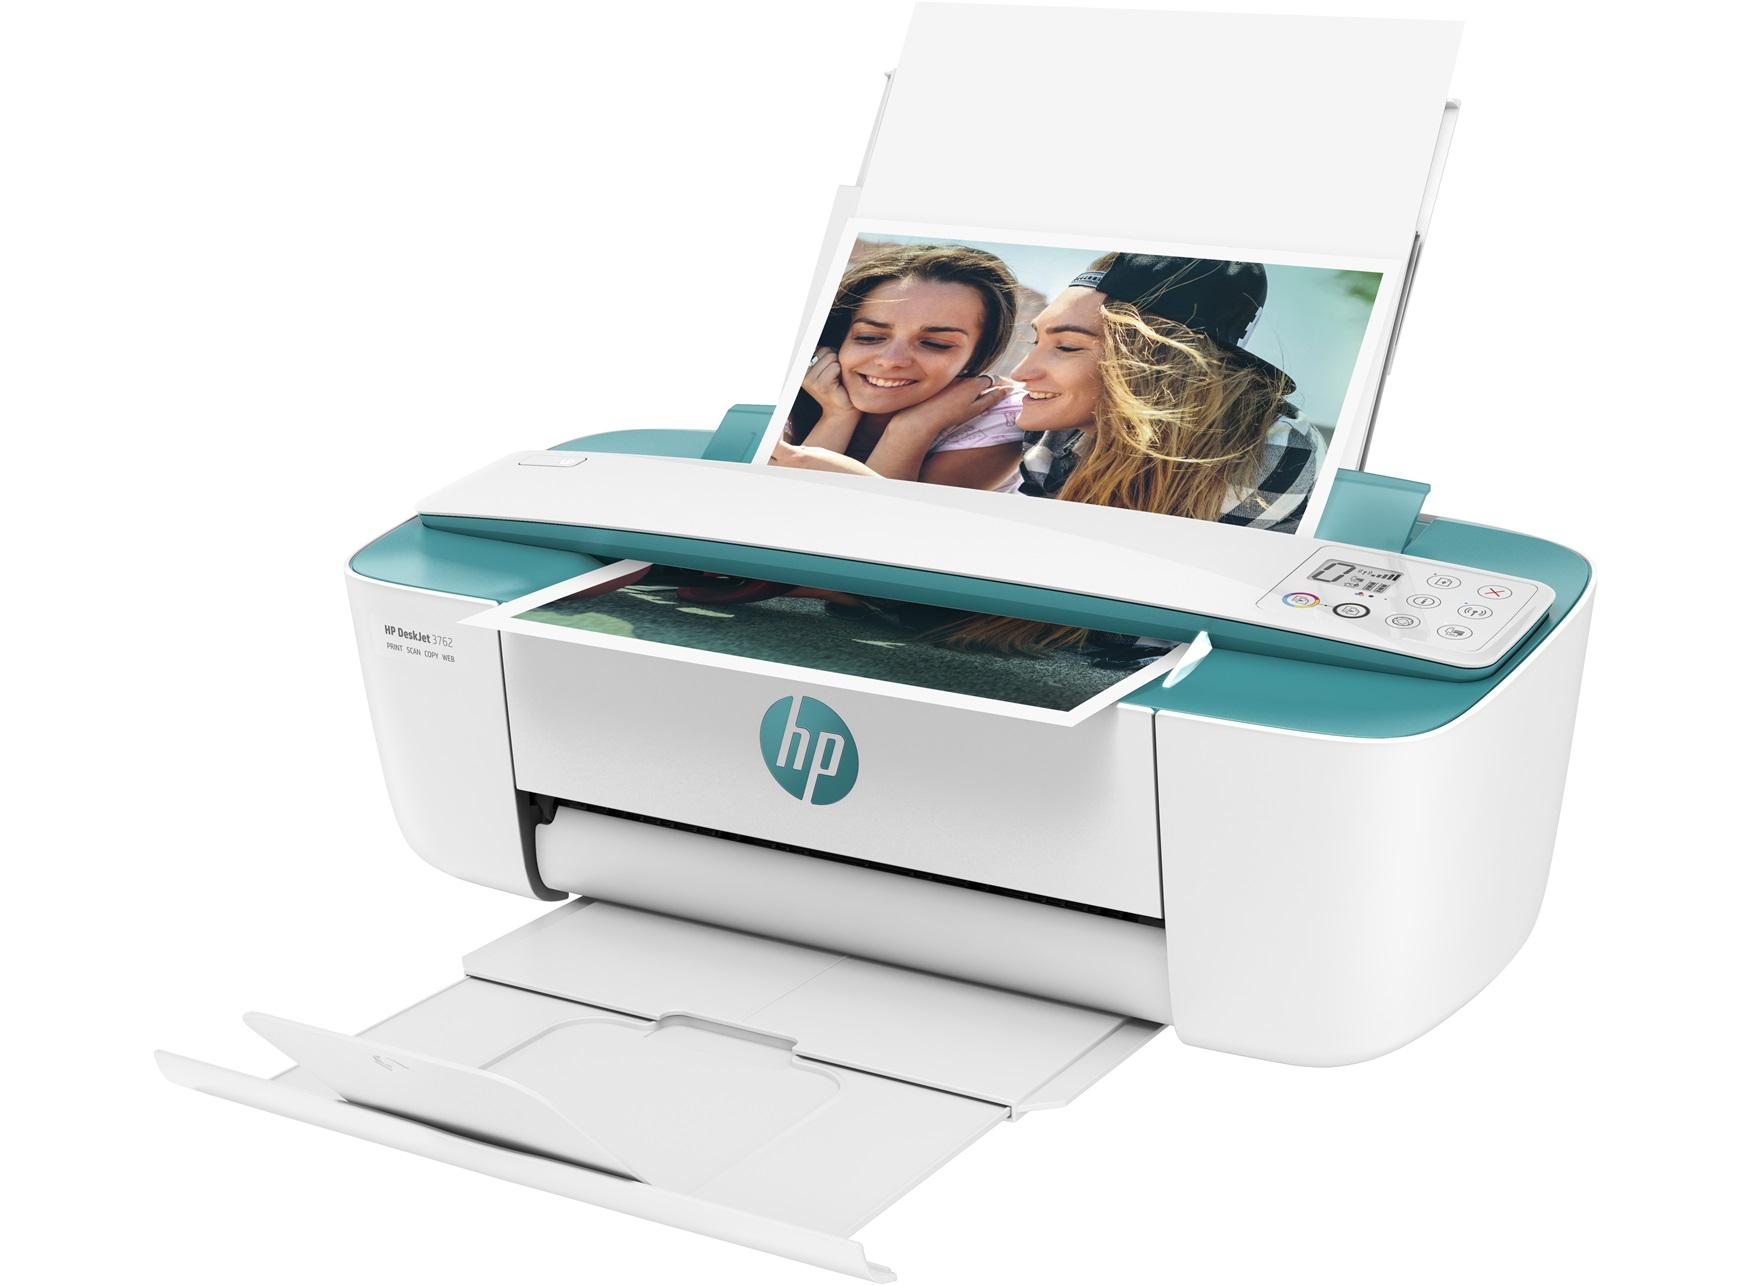 HP DeskJet 3762 All-in-One - imprimante multifonctions jet d'encre couleur A4 - Wifi - recto-verso manuel